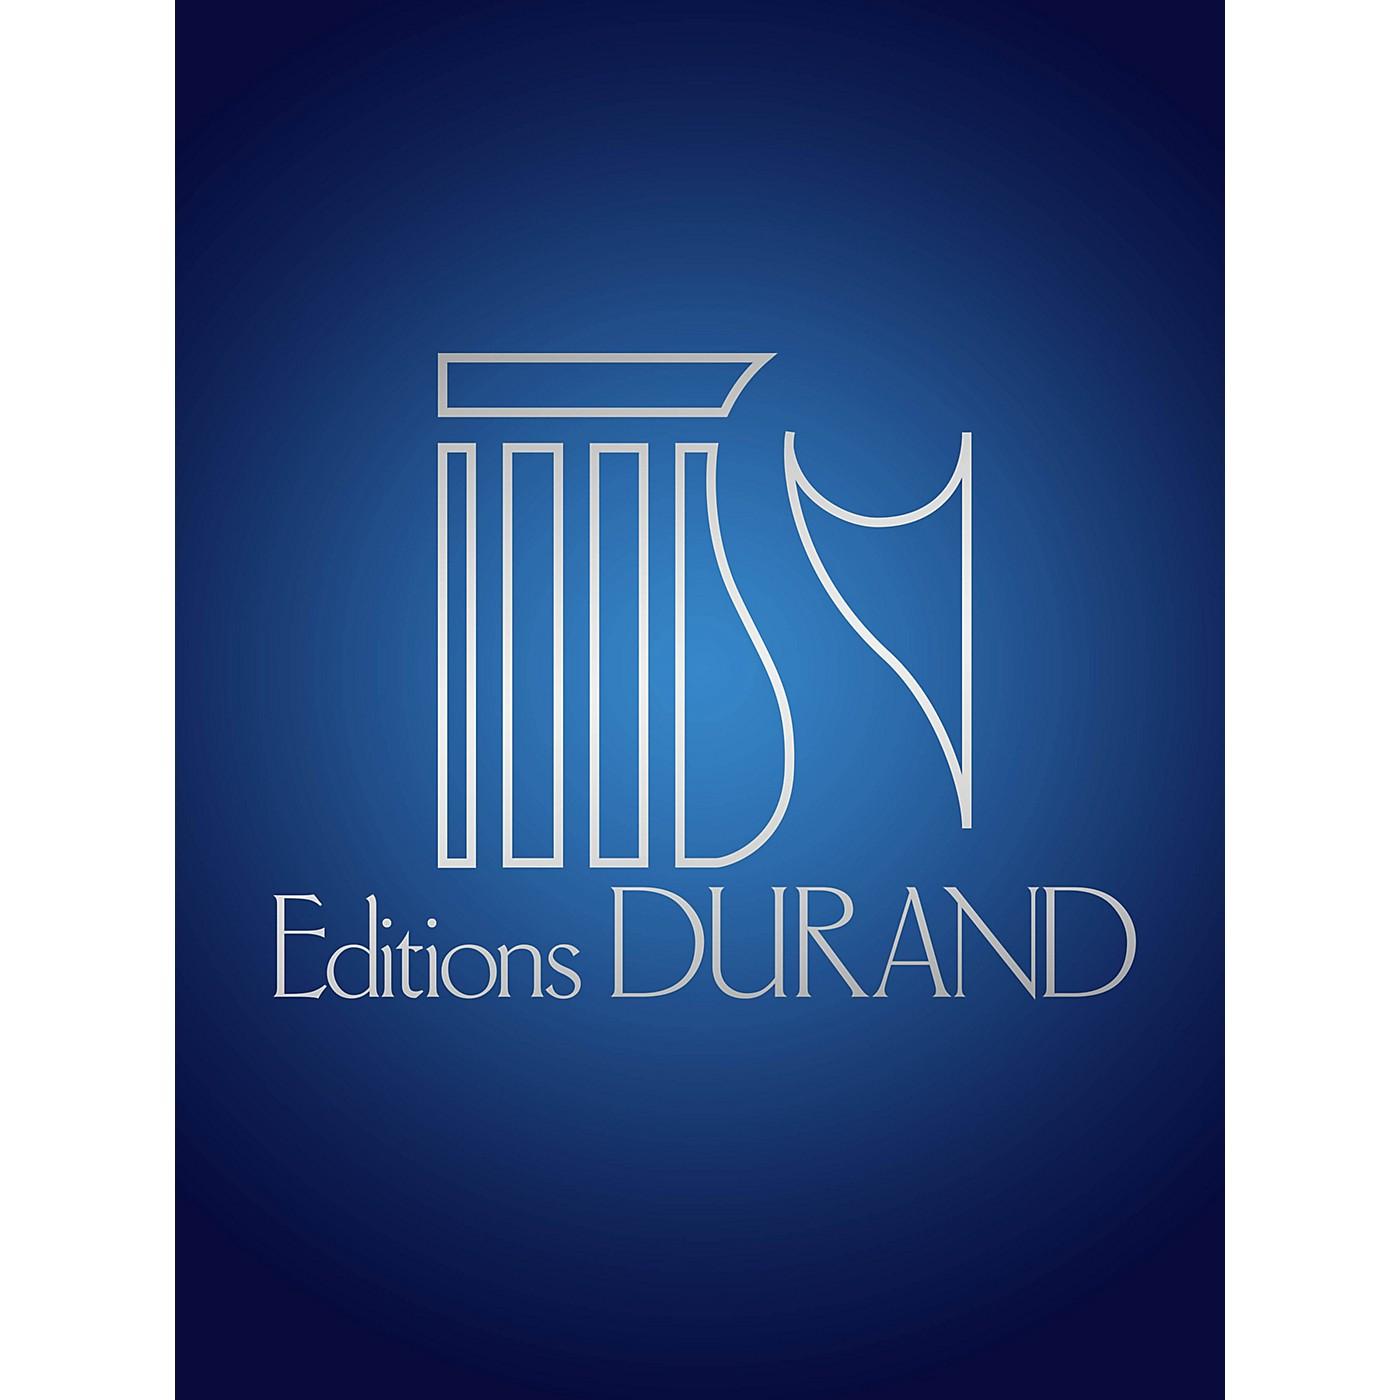 Hal Leonard Musica A Cinque Piano Quintet Full Score Includes Piano Part Editions Durand Series thumbnail